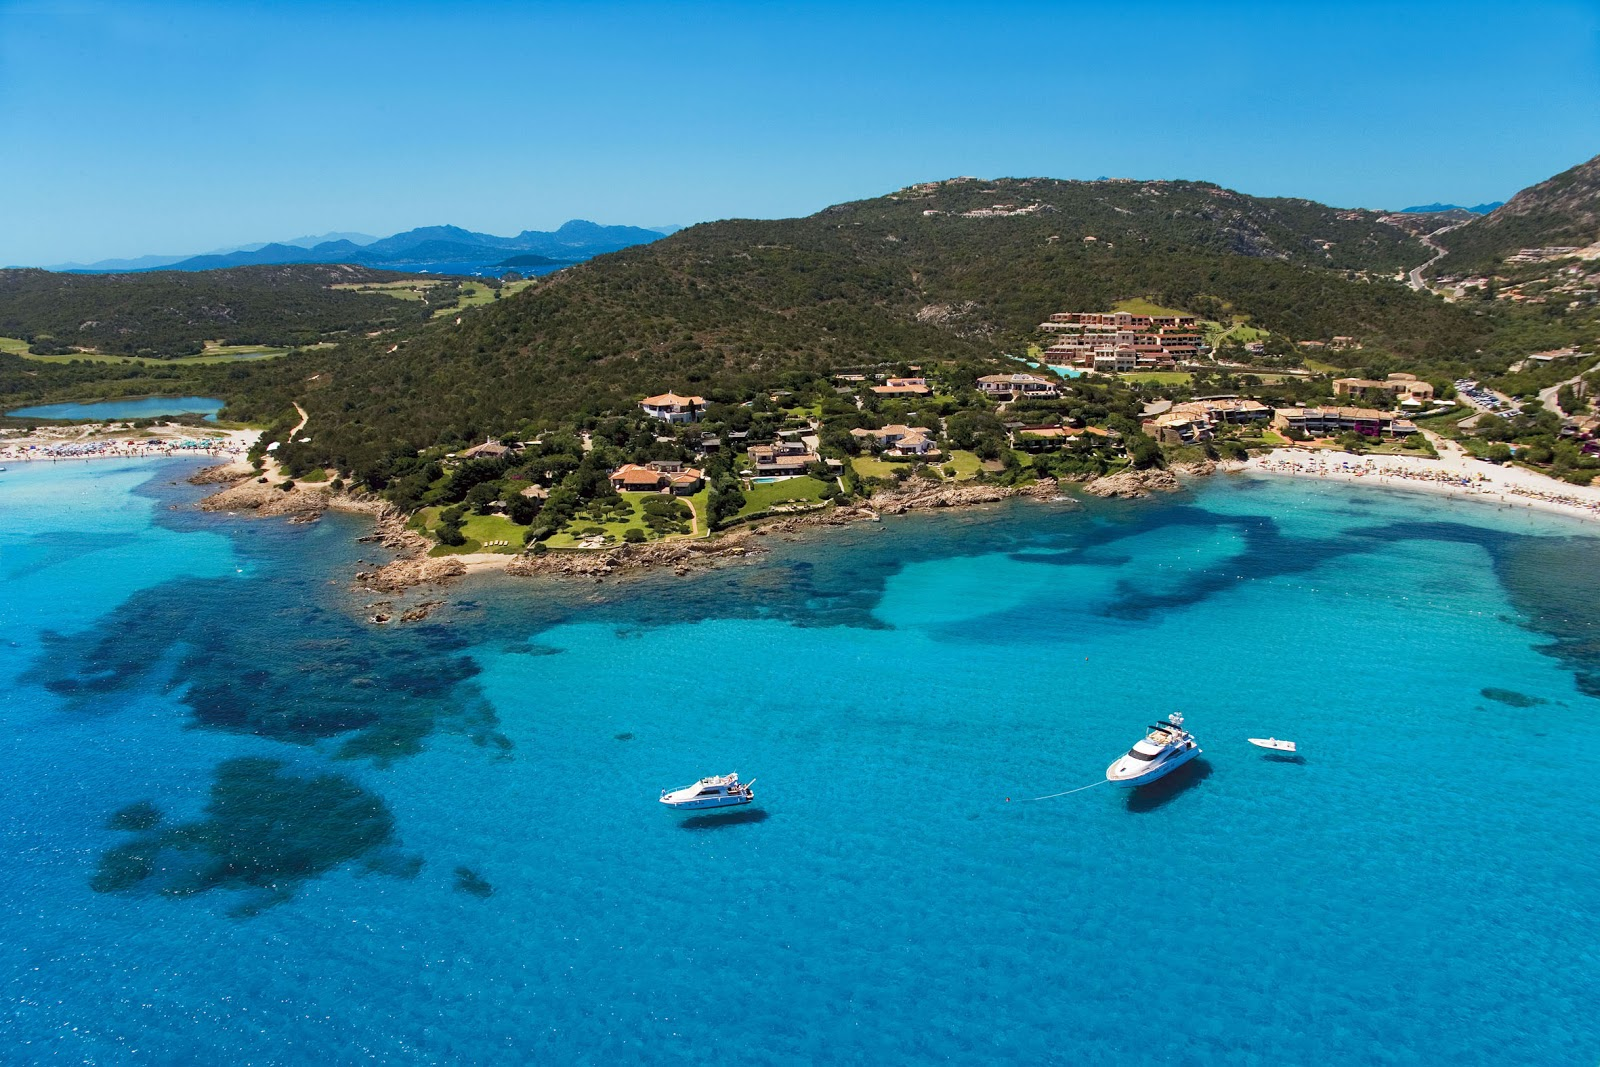 TOP WORLD TRAVEL DESTINATIONS: Sardinia, Italy